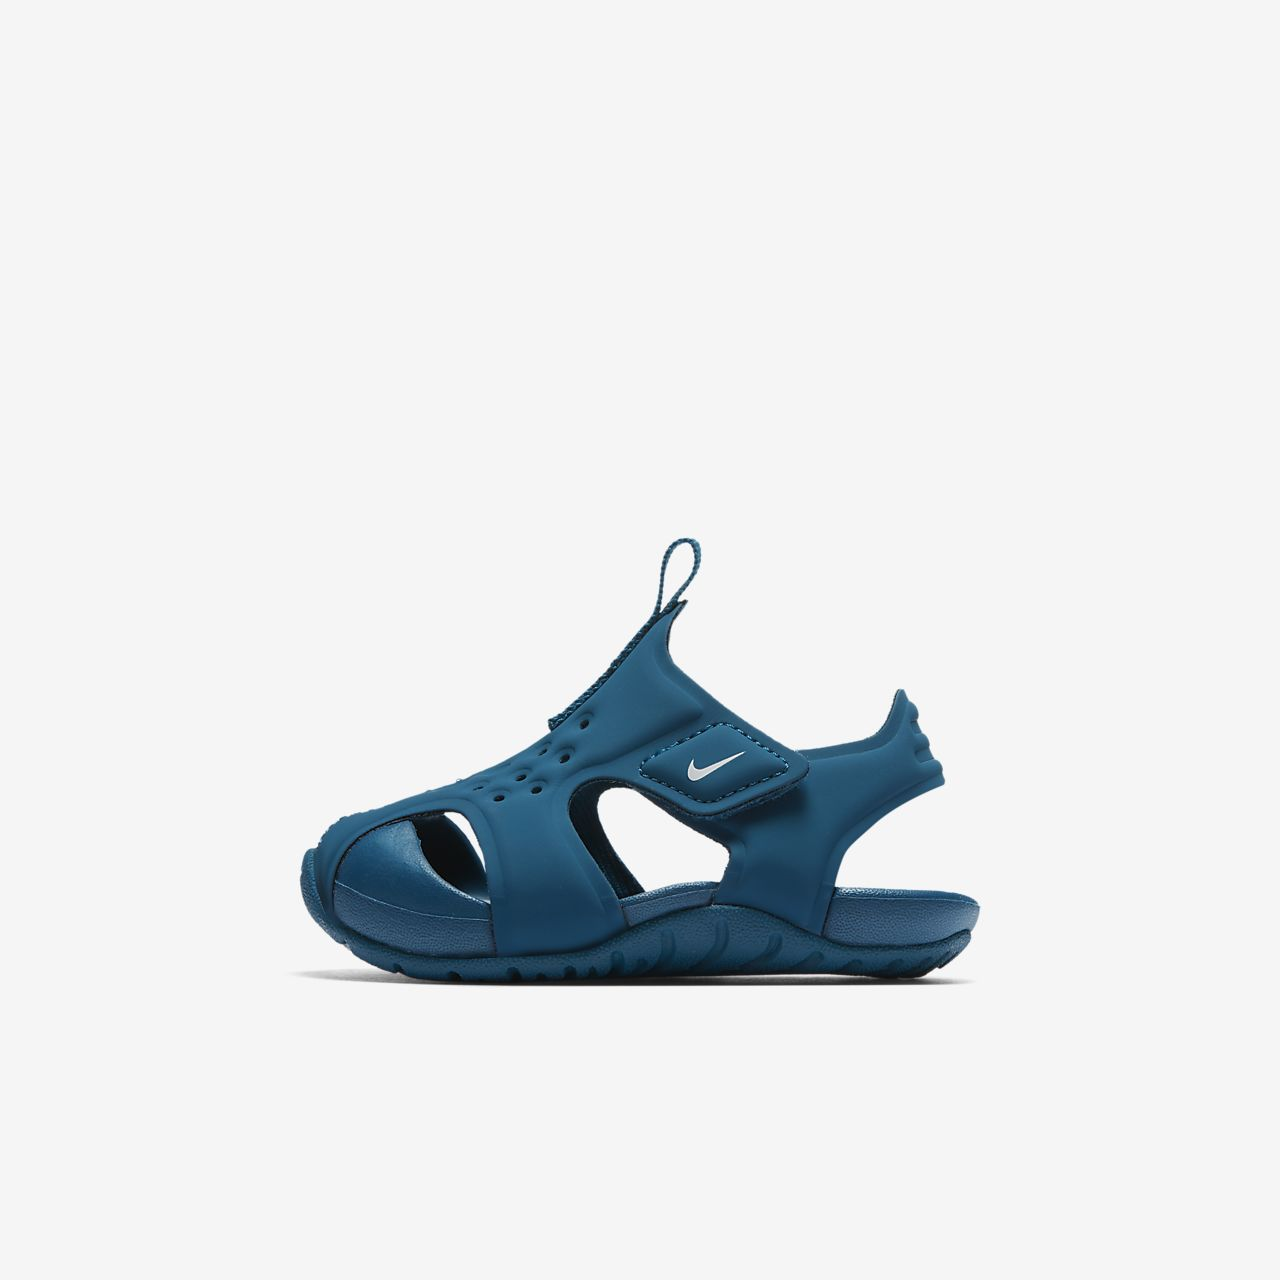 Sandalia Nike Sunray Protect 2 para bebés   niños pequeños. Nike.com CL 983dc6dc0cd